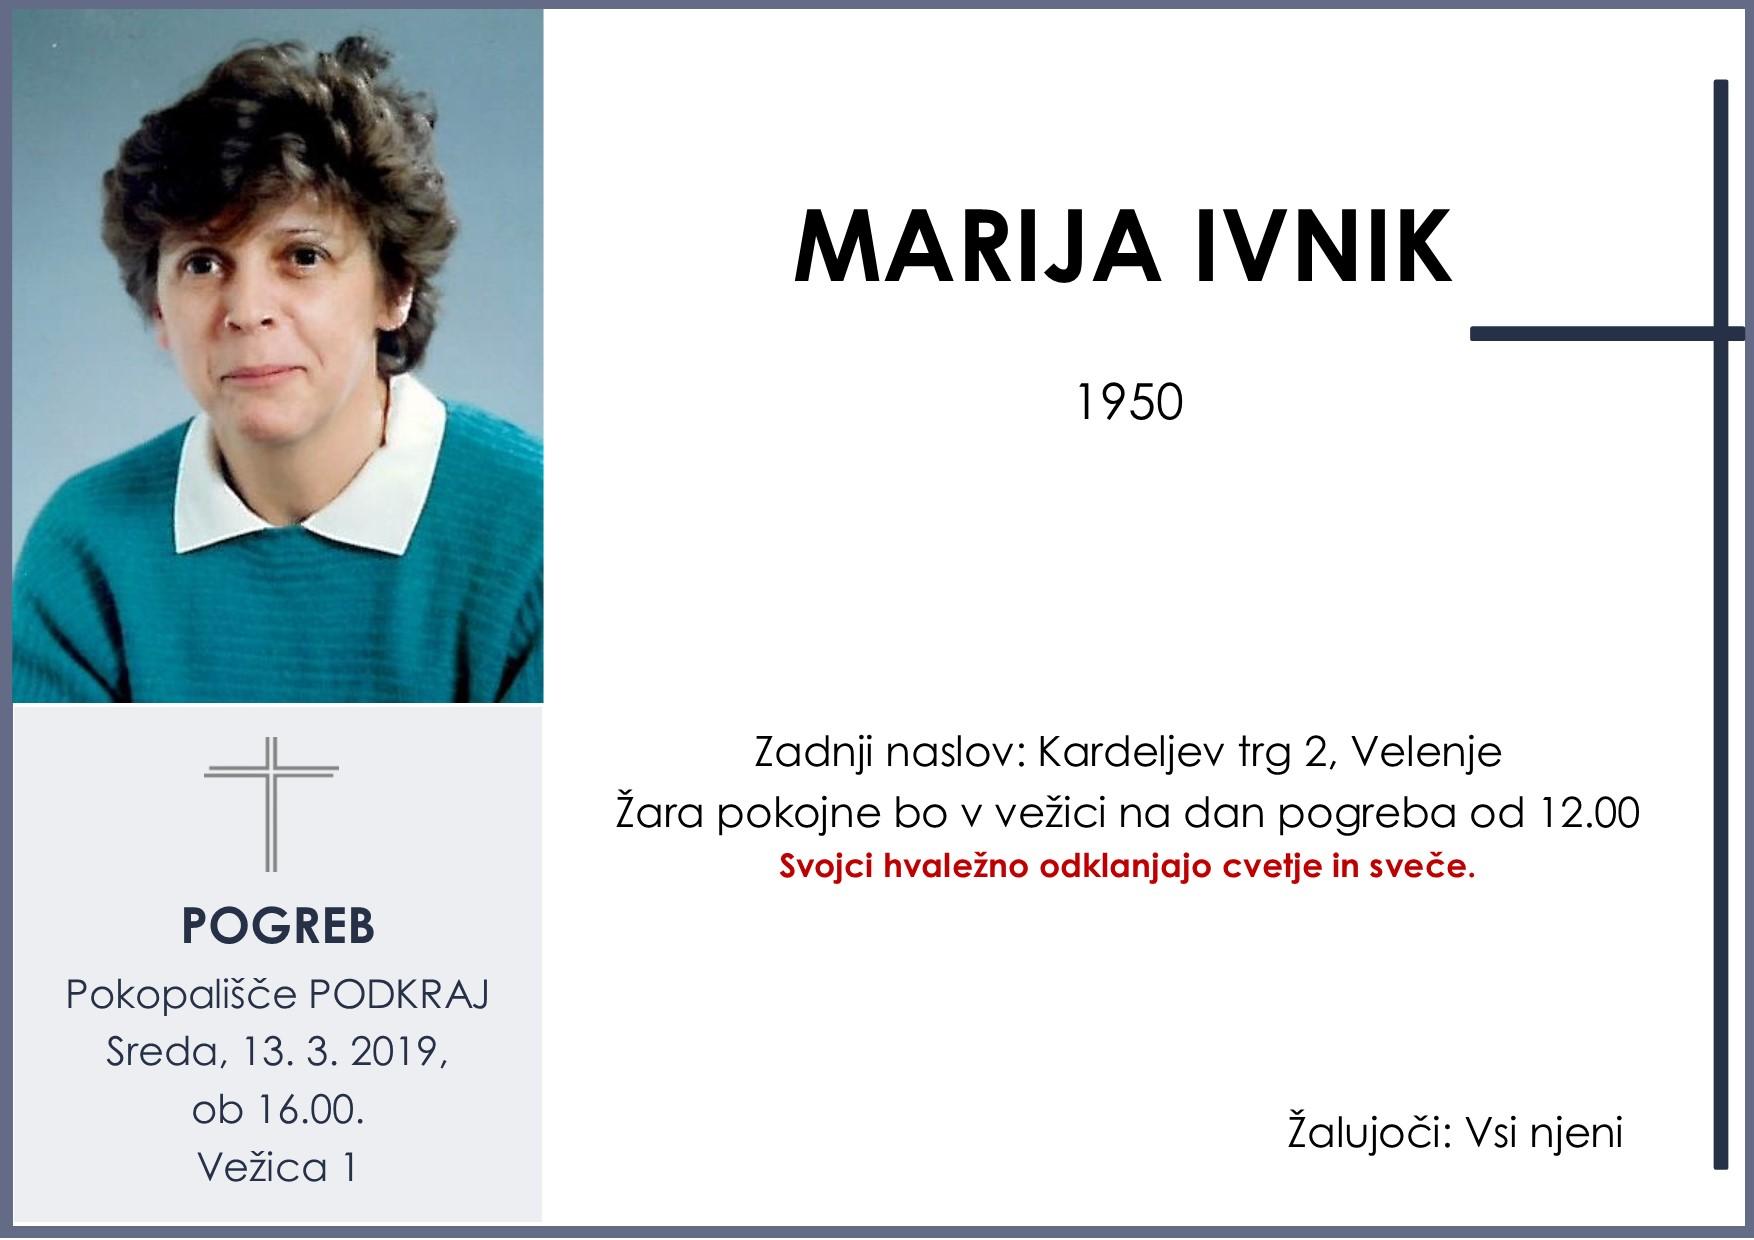 MARIJA IVNIK, Podkraj, 13. 03. 2019